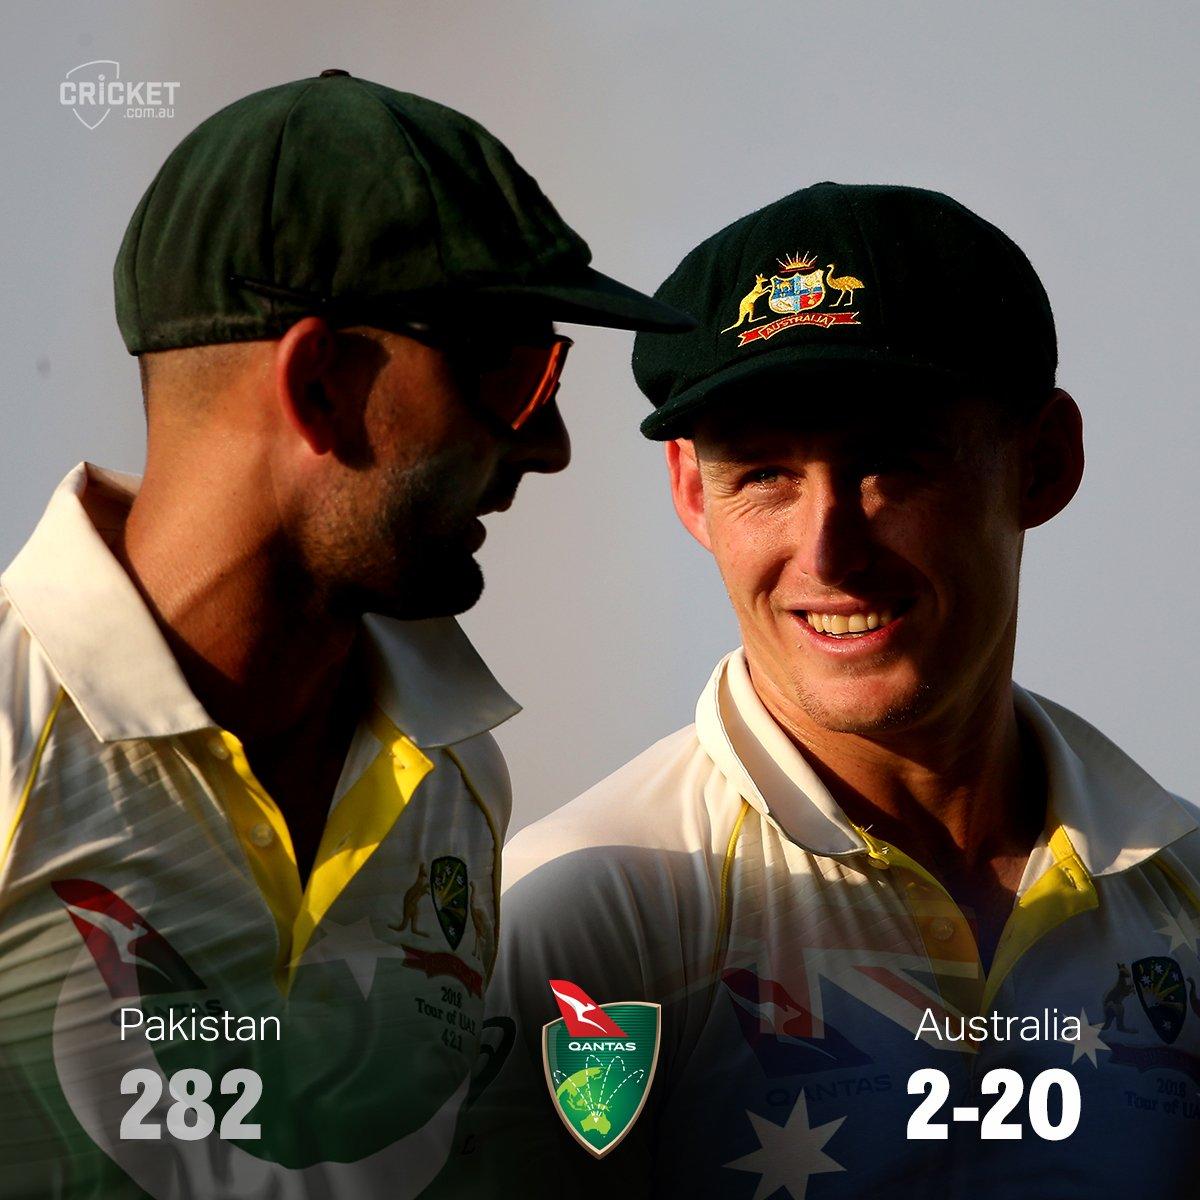 cricket.com.au's photo on #pakvaus